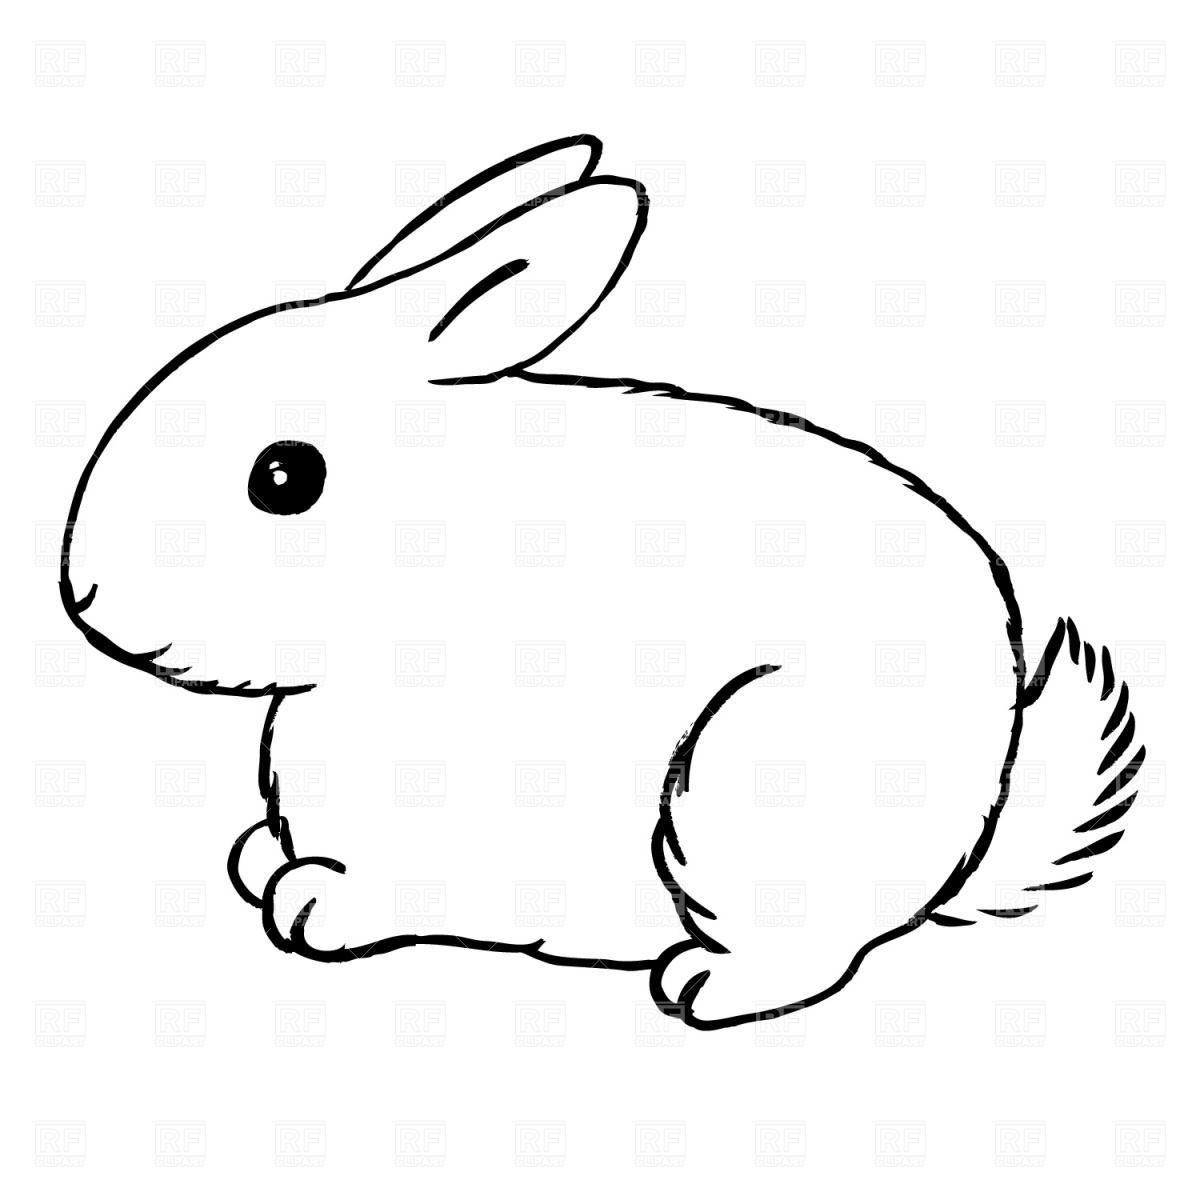 1200x1200 Hare Clipart Rabbit Outline